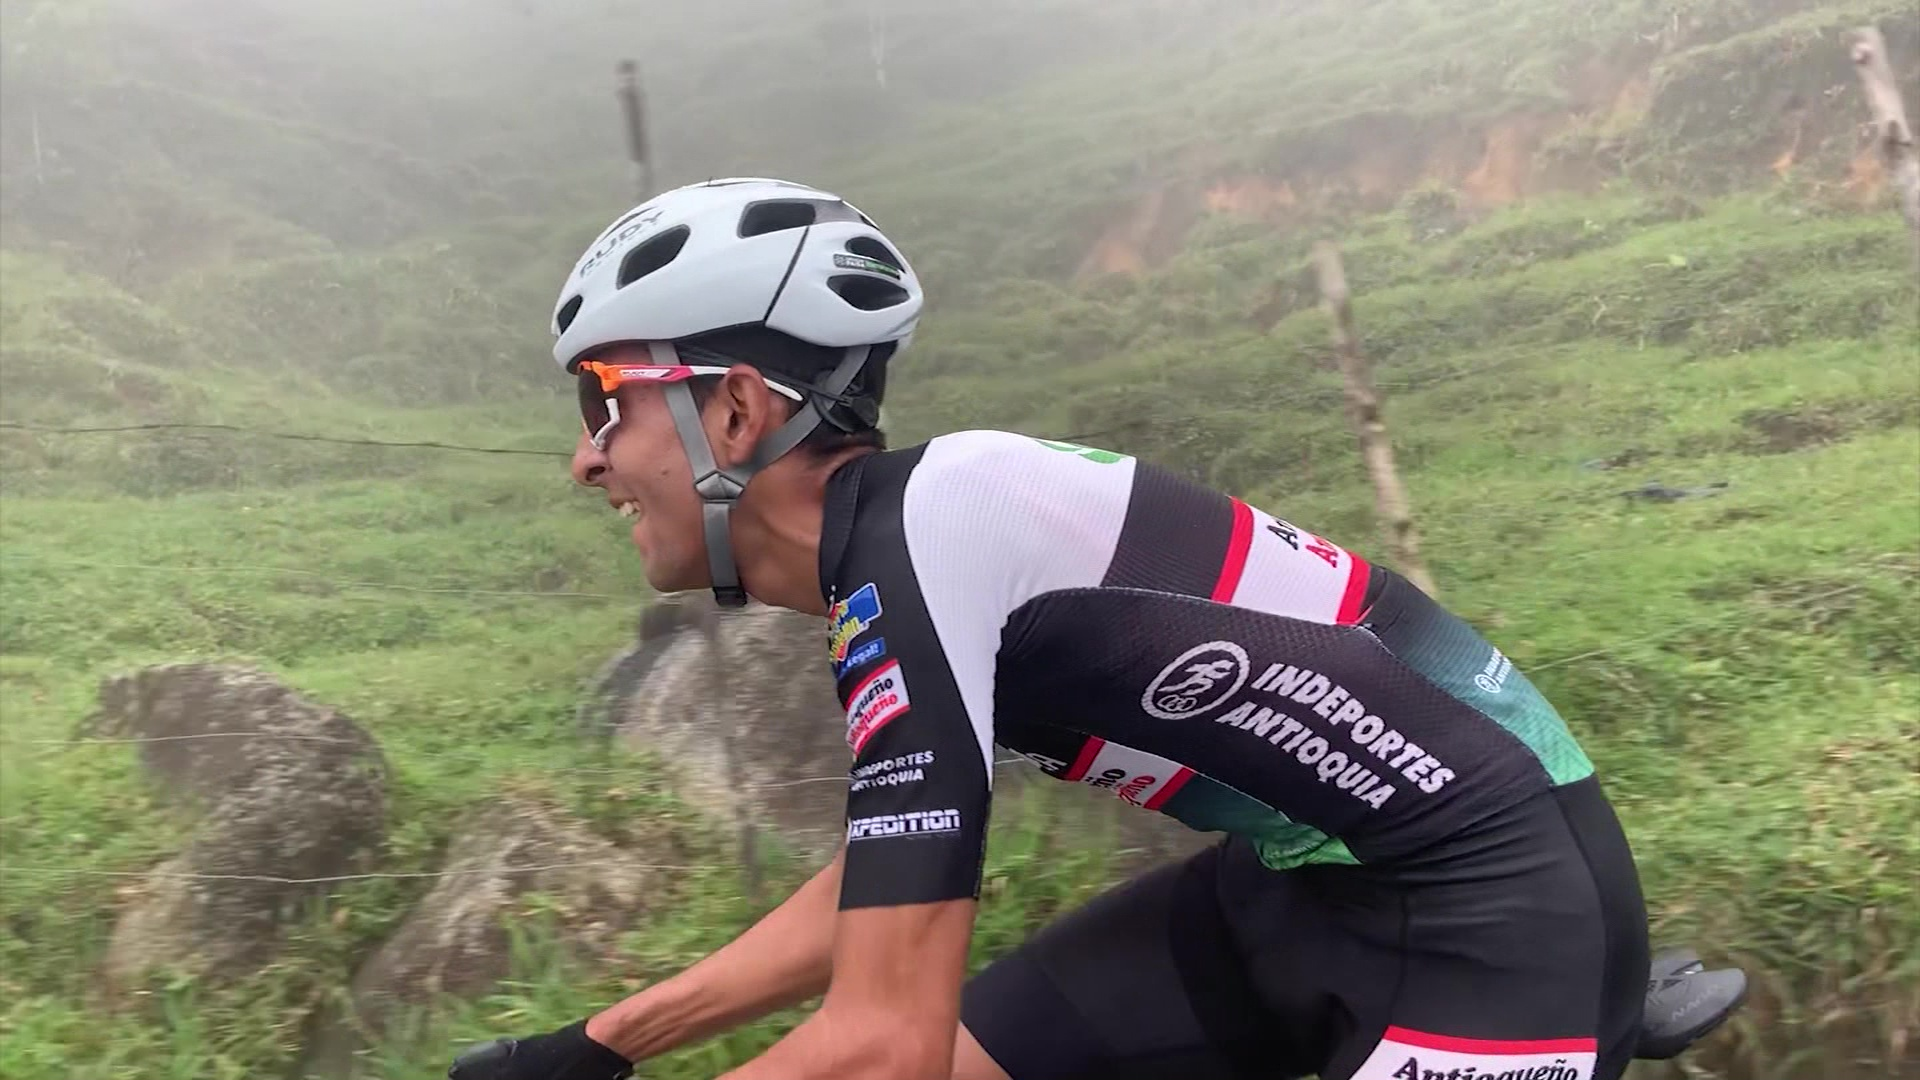 Orgullo Paisa listo para la Vuelta de la Juventud